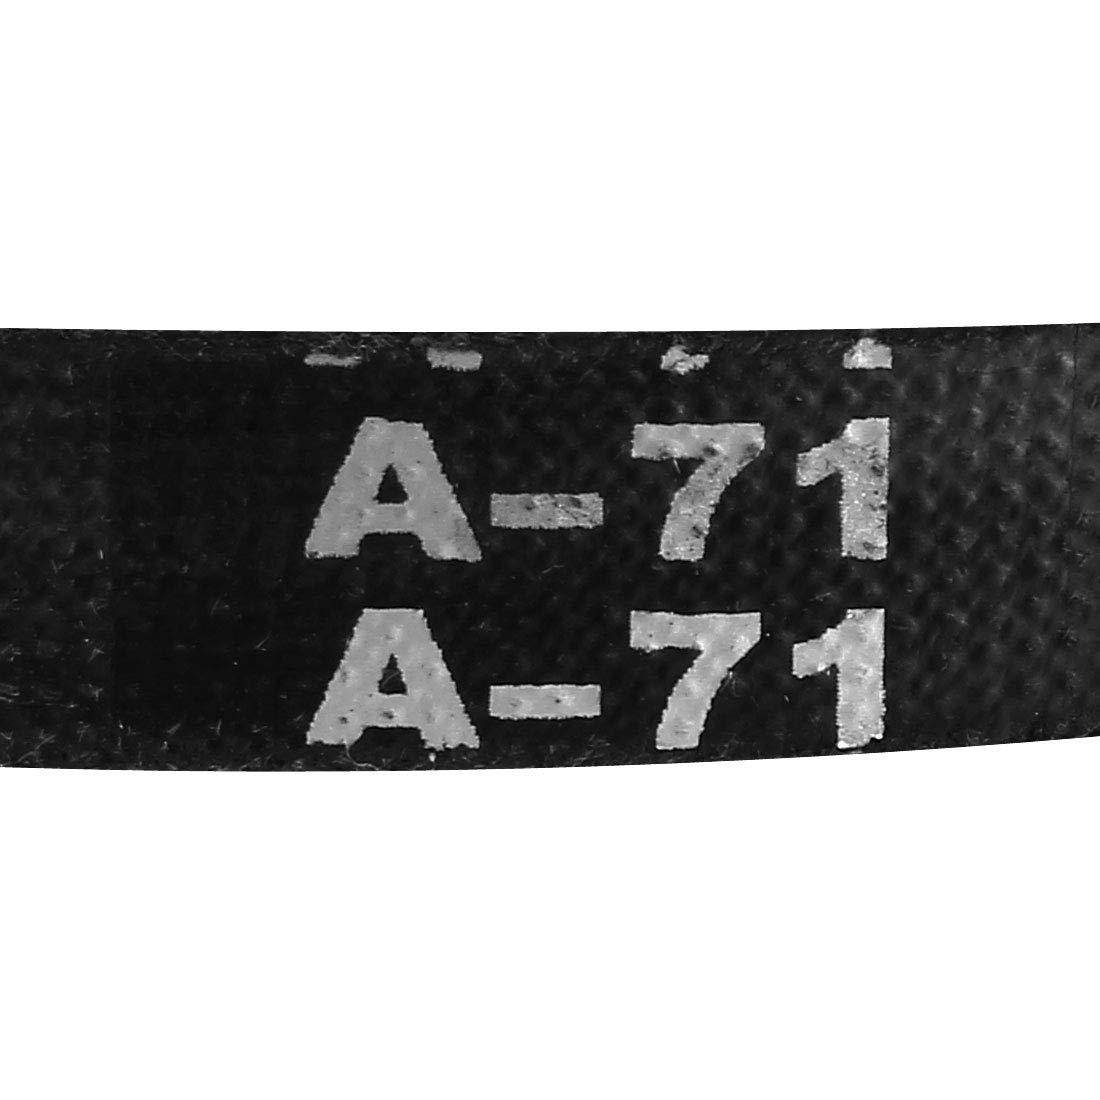 uxcell A-67 Drive V-Belt Girth 67-inch Industrial Power Rubber Transmission Belt